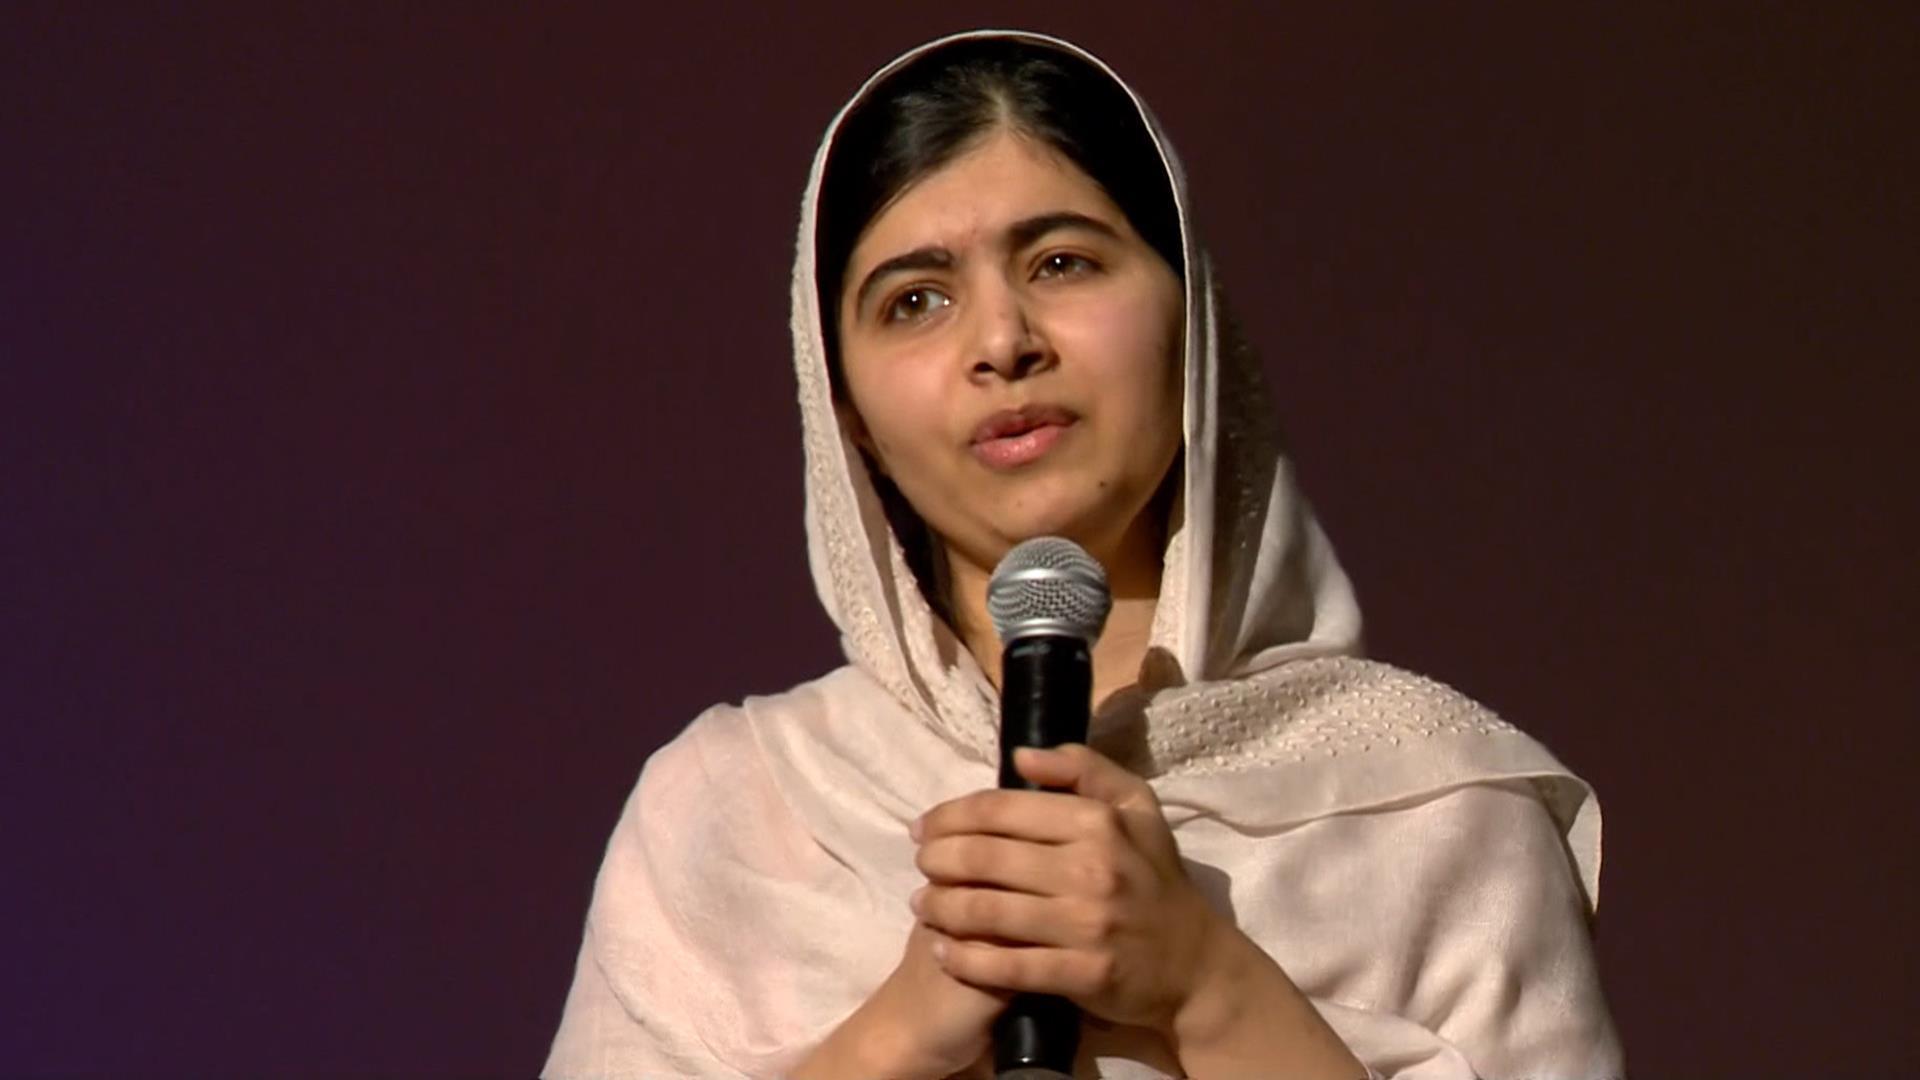 Malala Yousafzai Pays Surprise Visit To Colorado High School